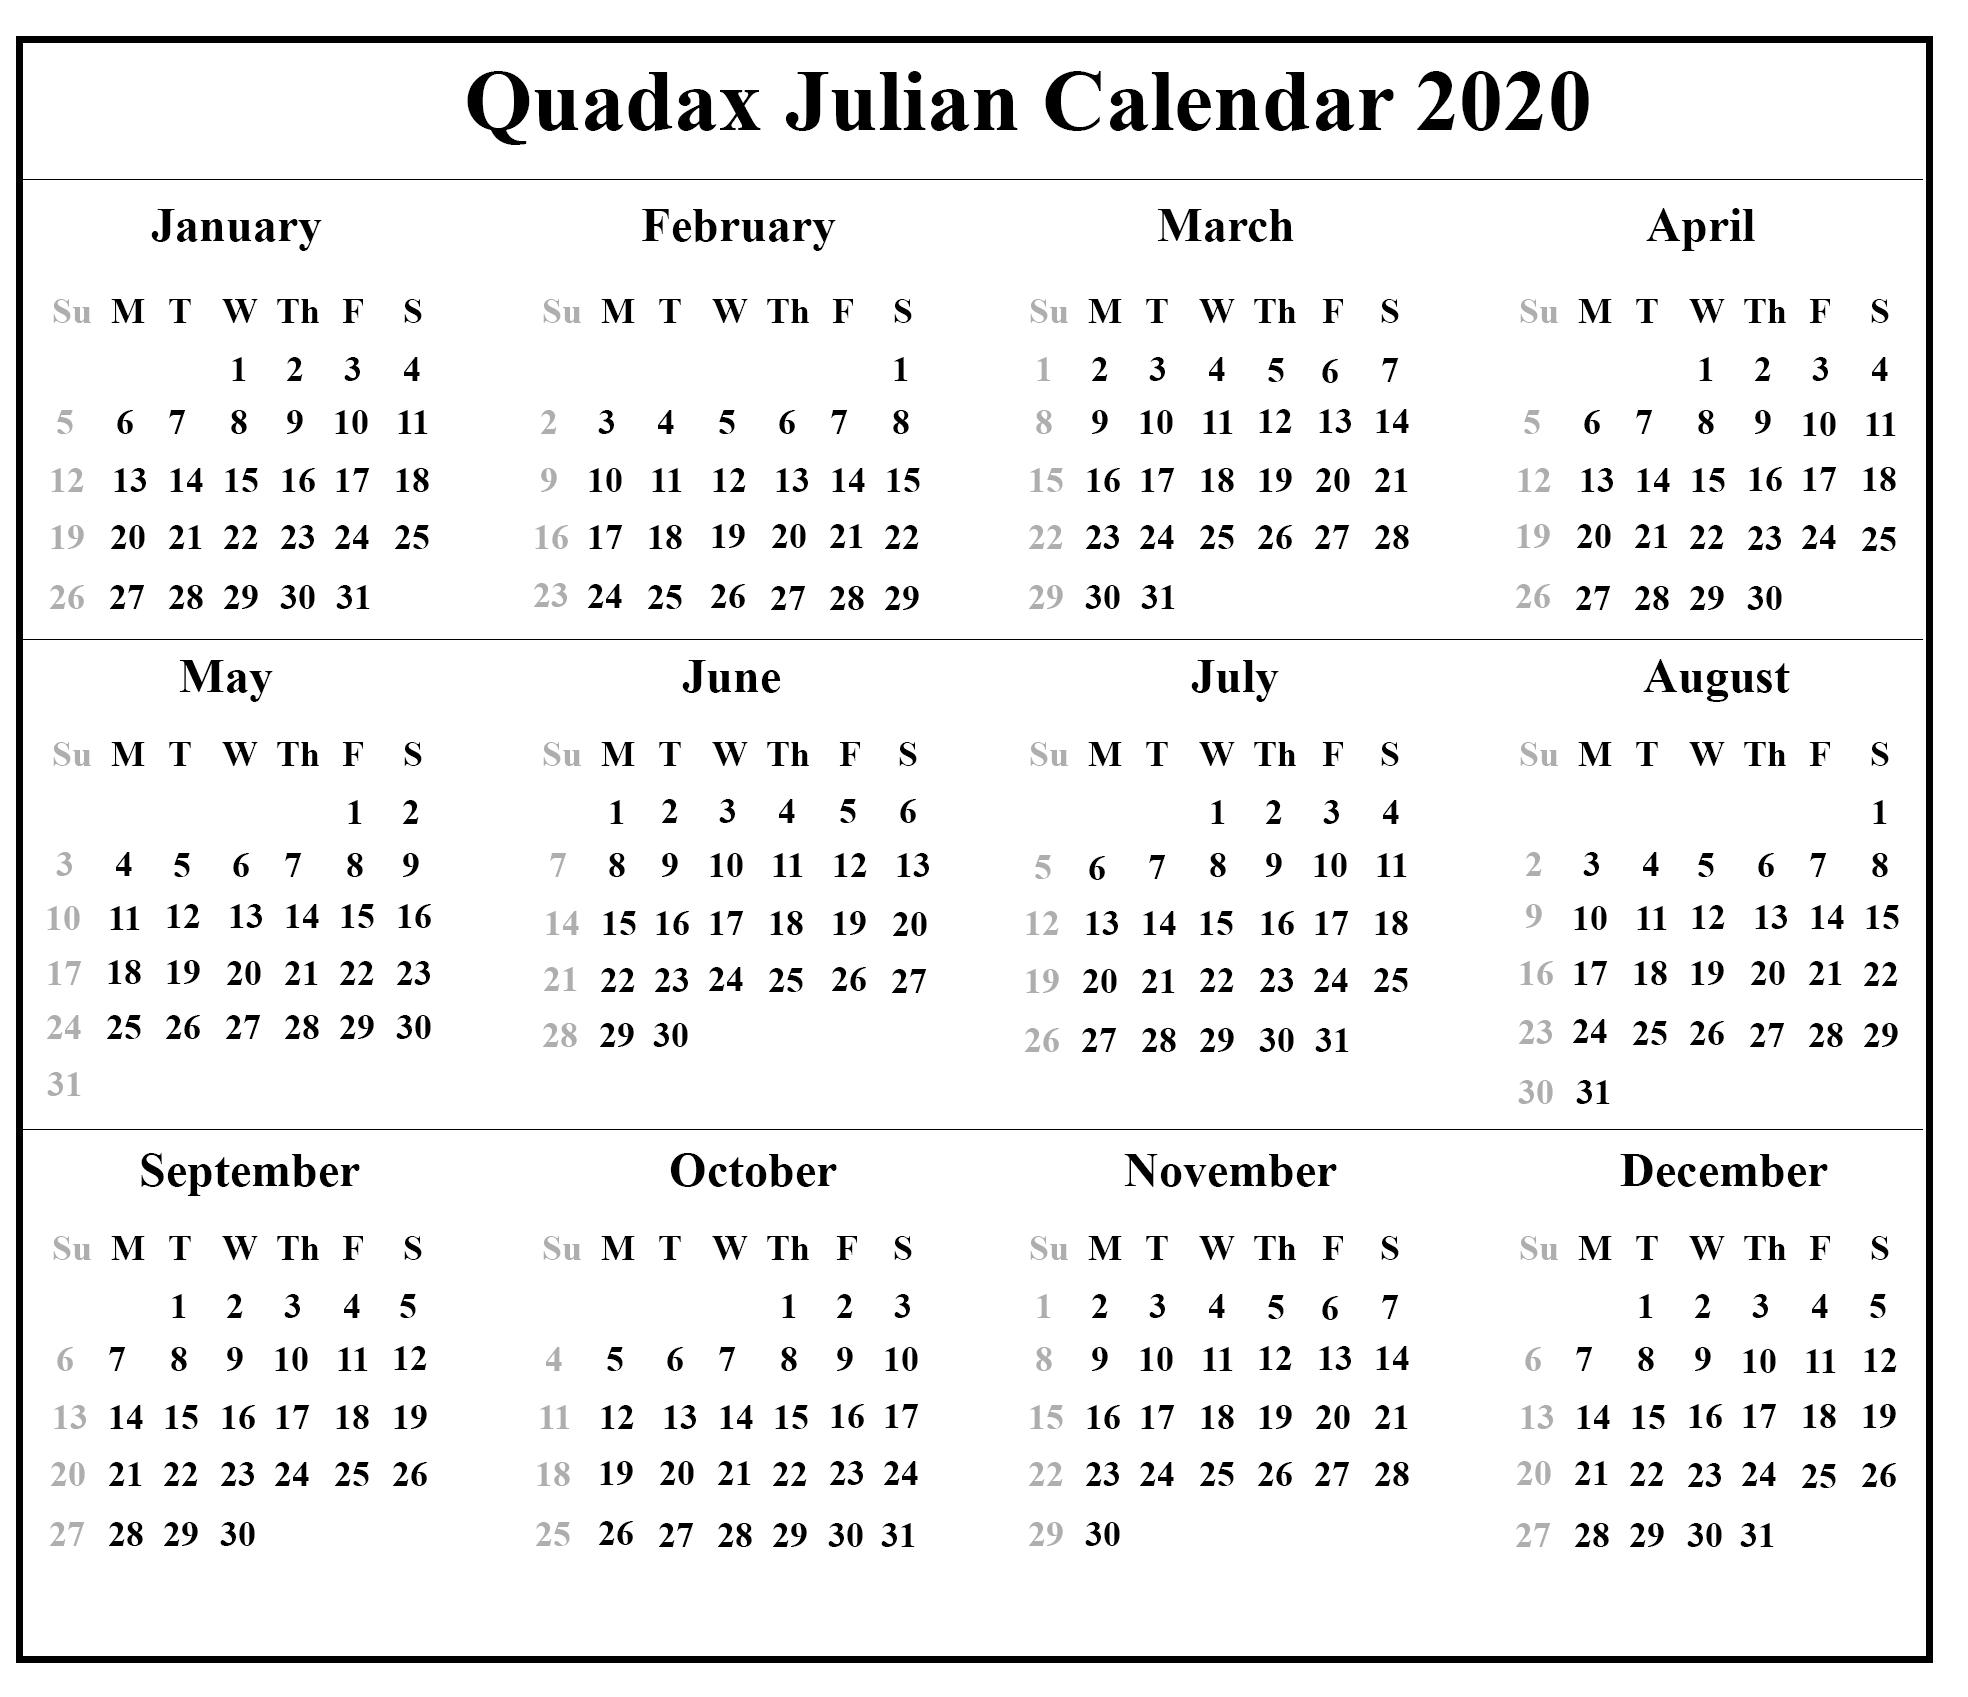 Quadax Julian Calendar 2020 Pdf | Example Calendar Printable regarding Julian Date Calendar Leap Year Pdf